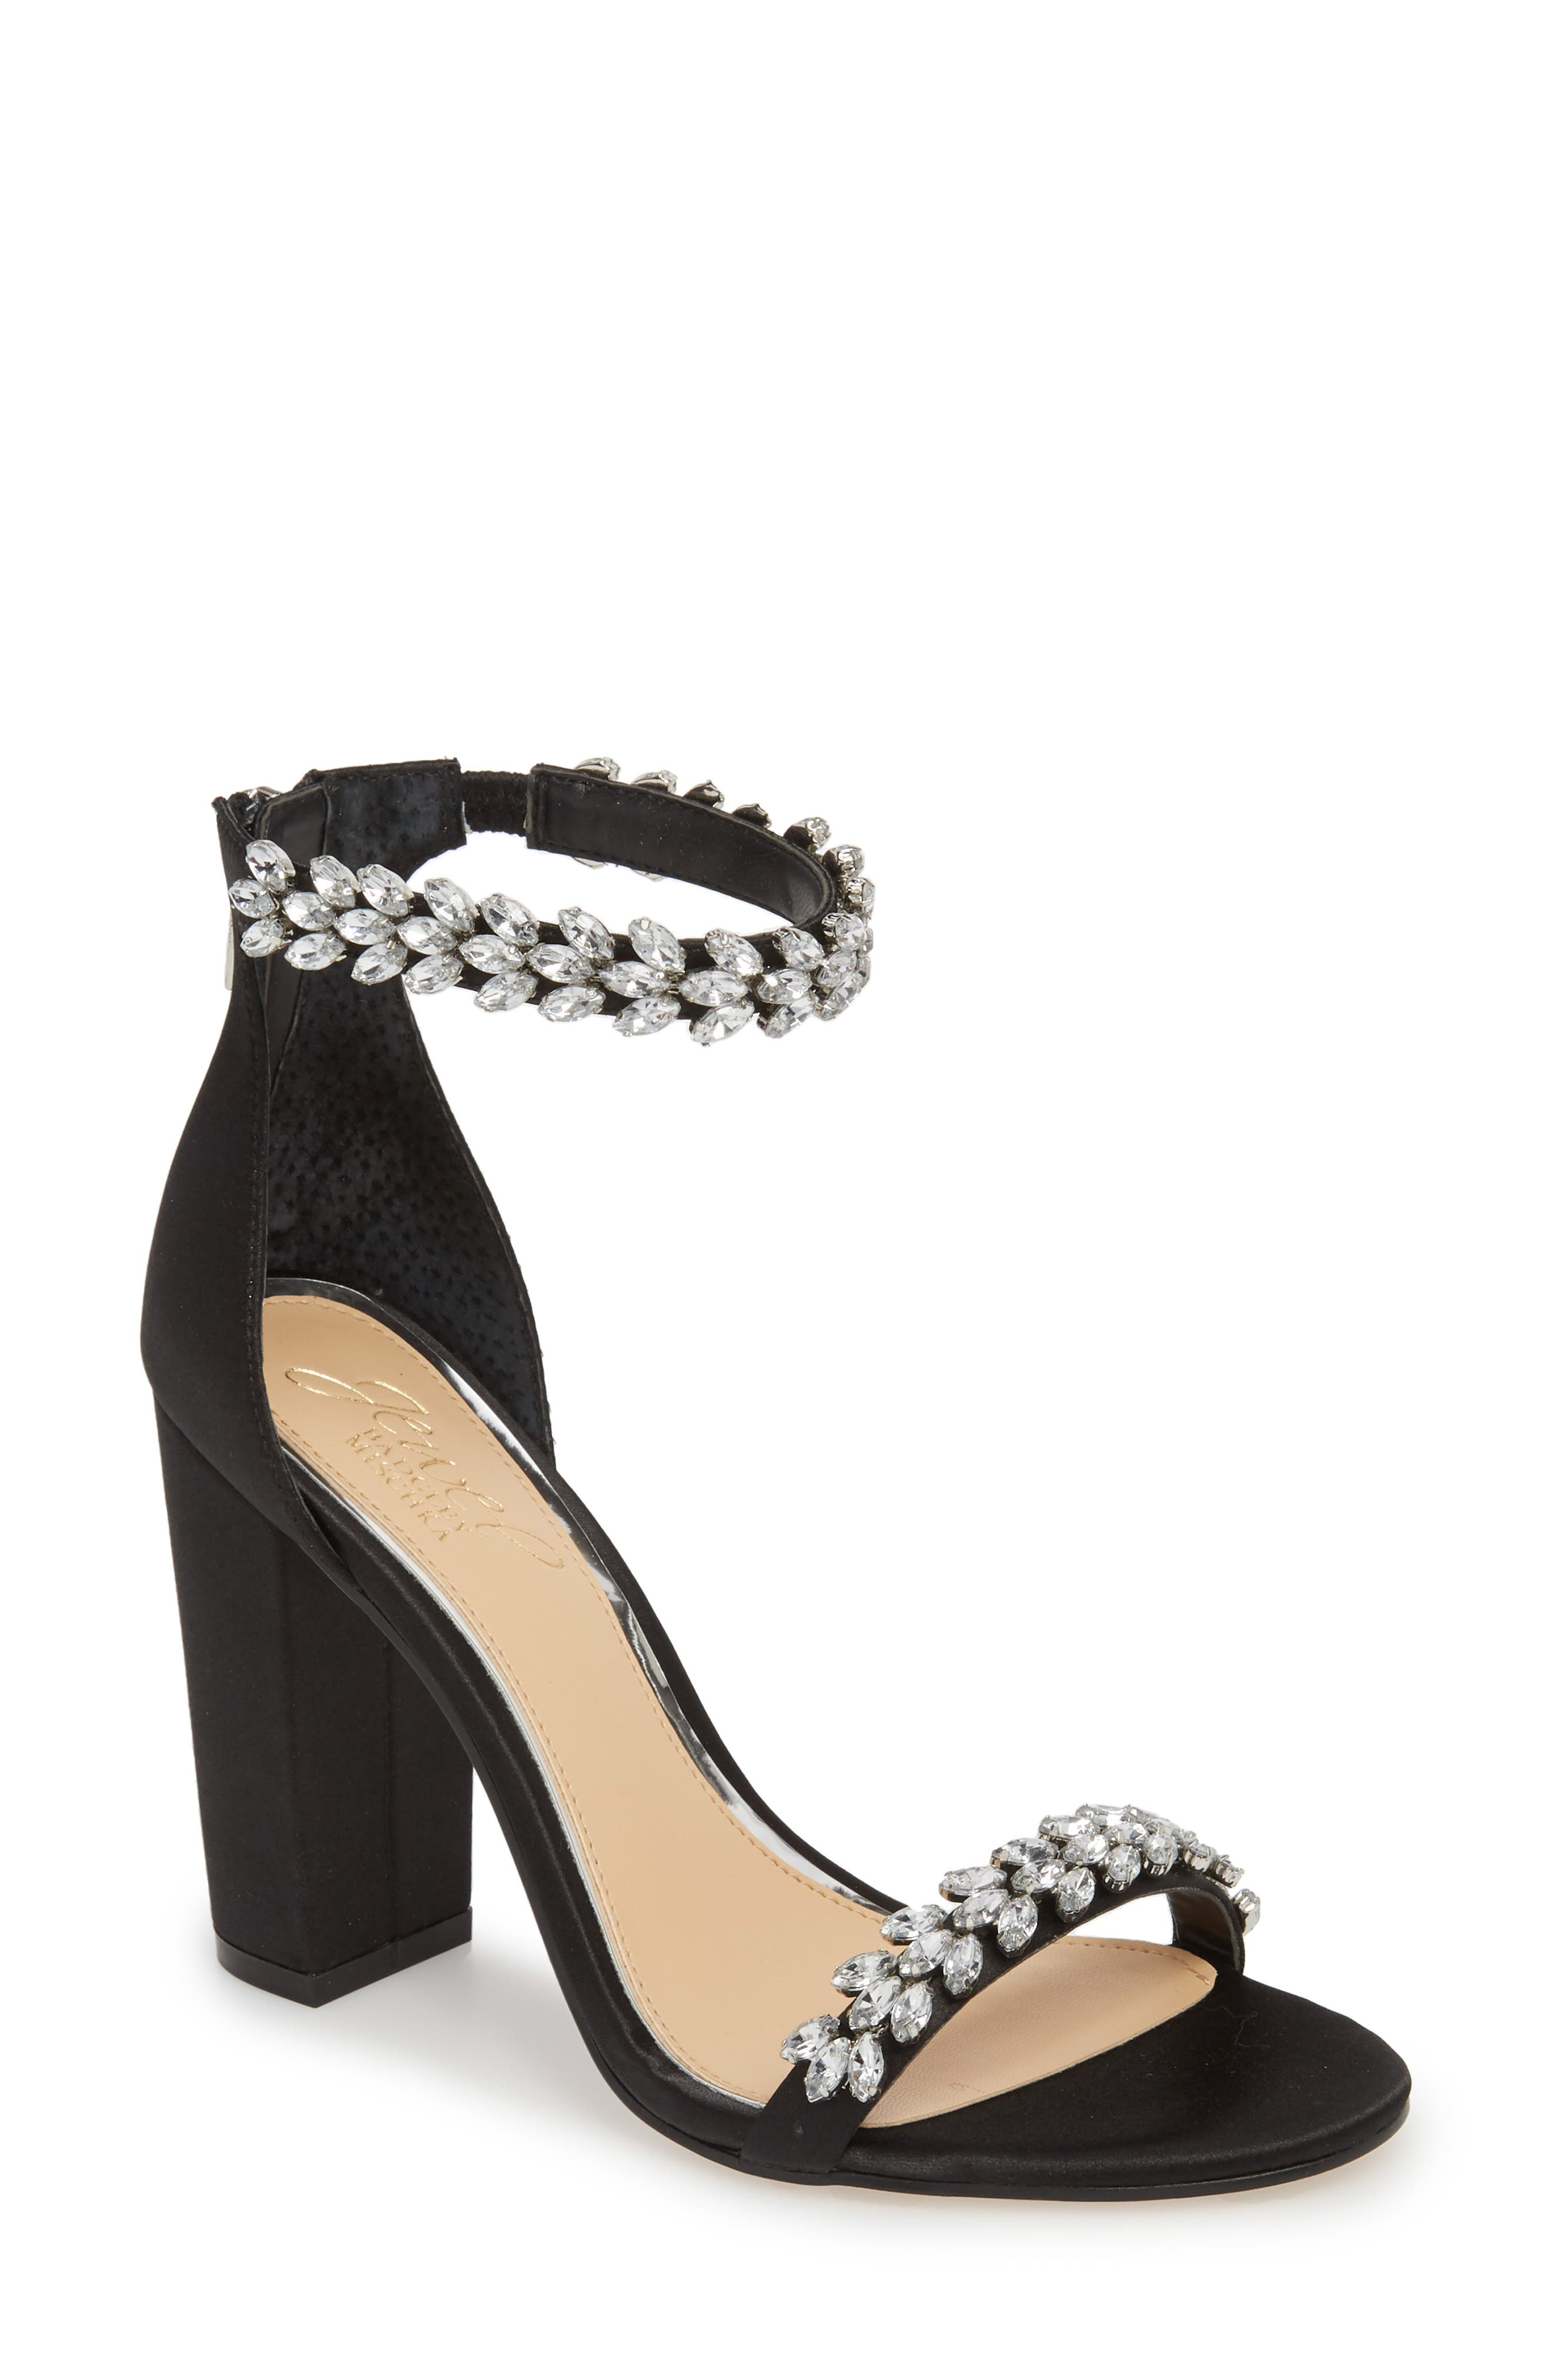 Jewel by Badgley Mischka Mayra Embellished Ankle Strap Sandal,                             Main thumbnail 1, color,                             BLACK SATIN